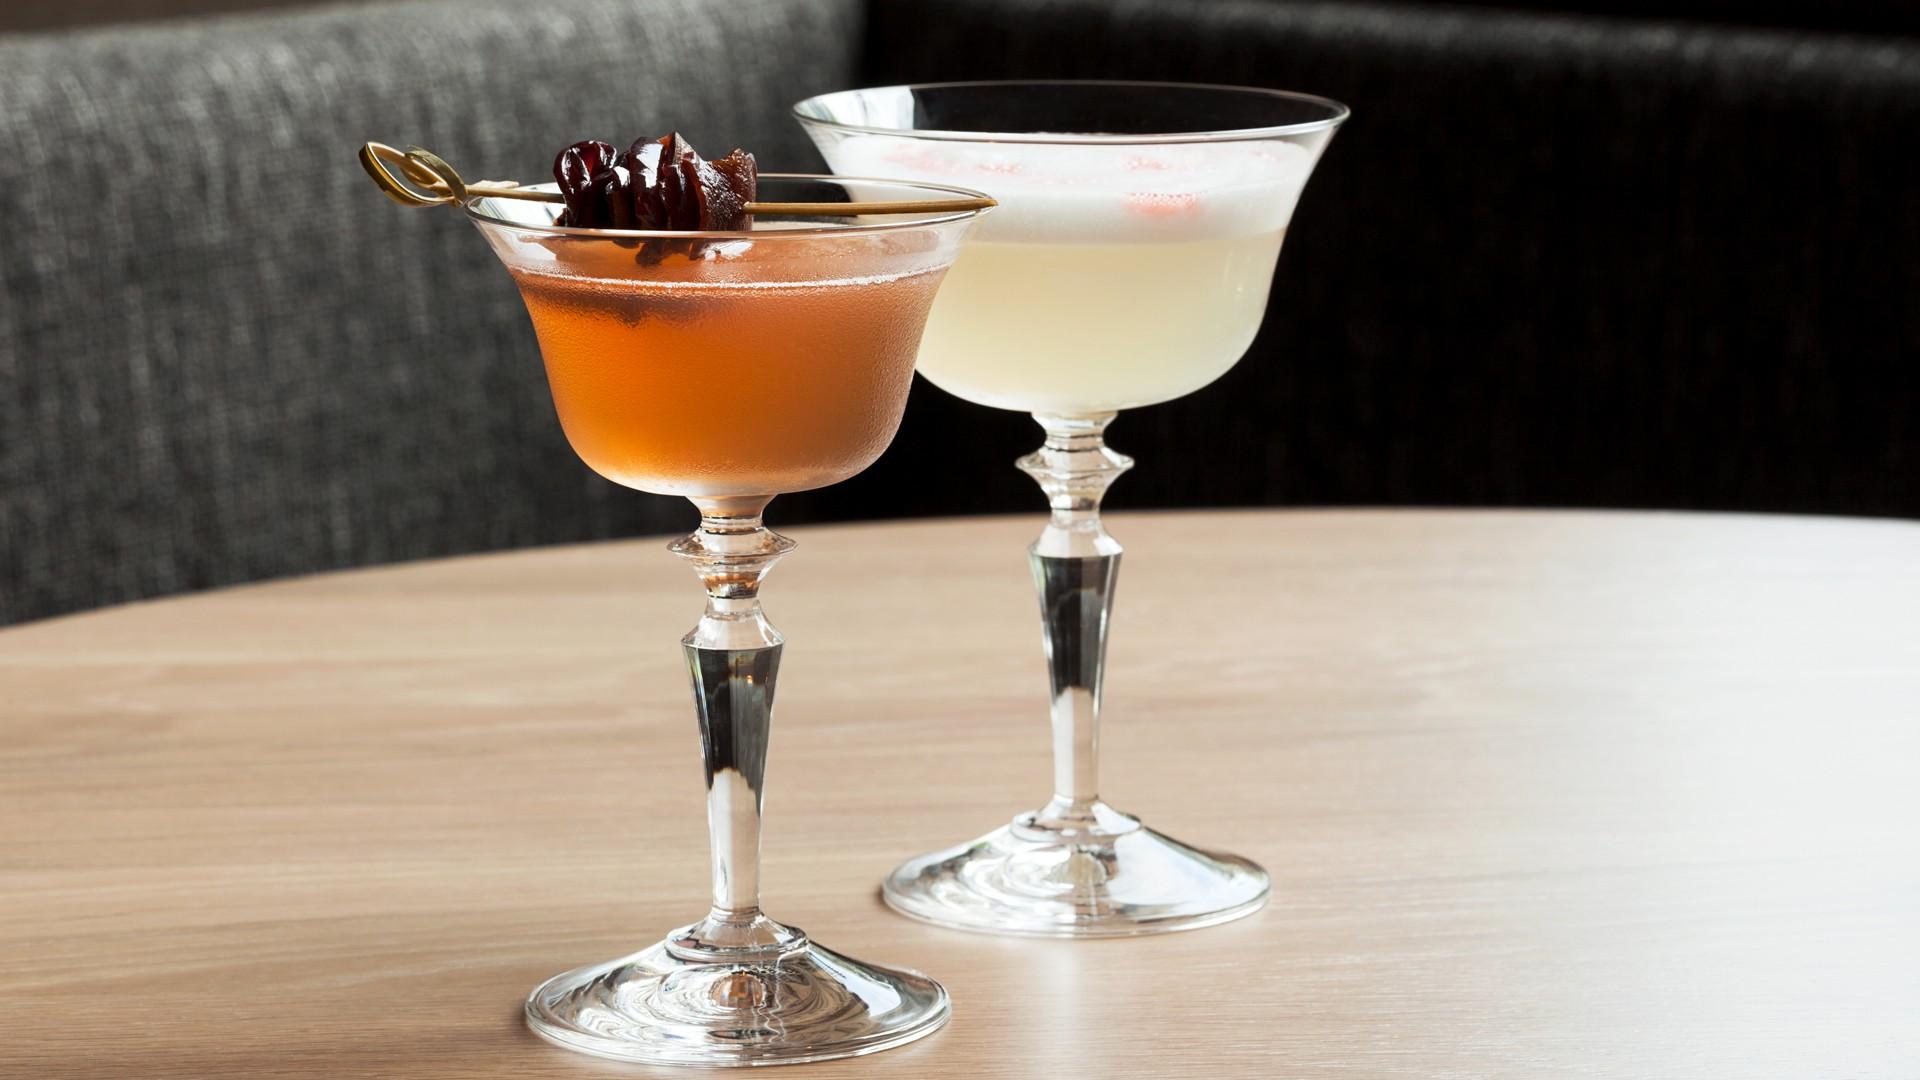 Cocktail bar Toronto; Ascari Enoteca on King West.